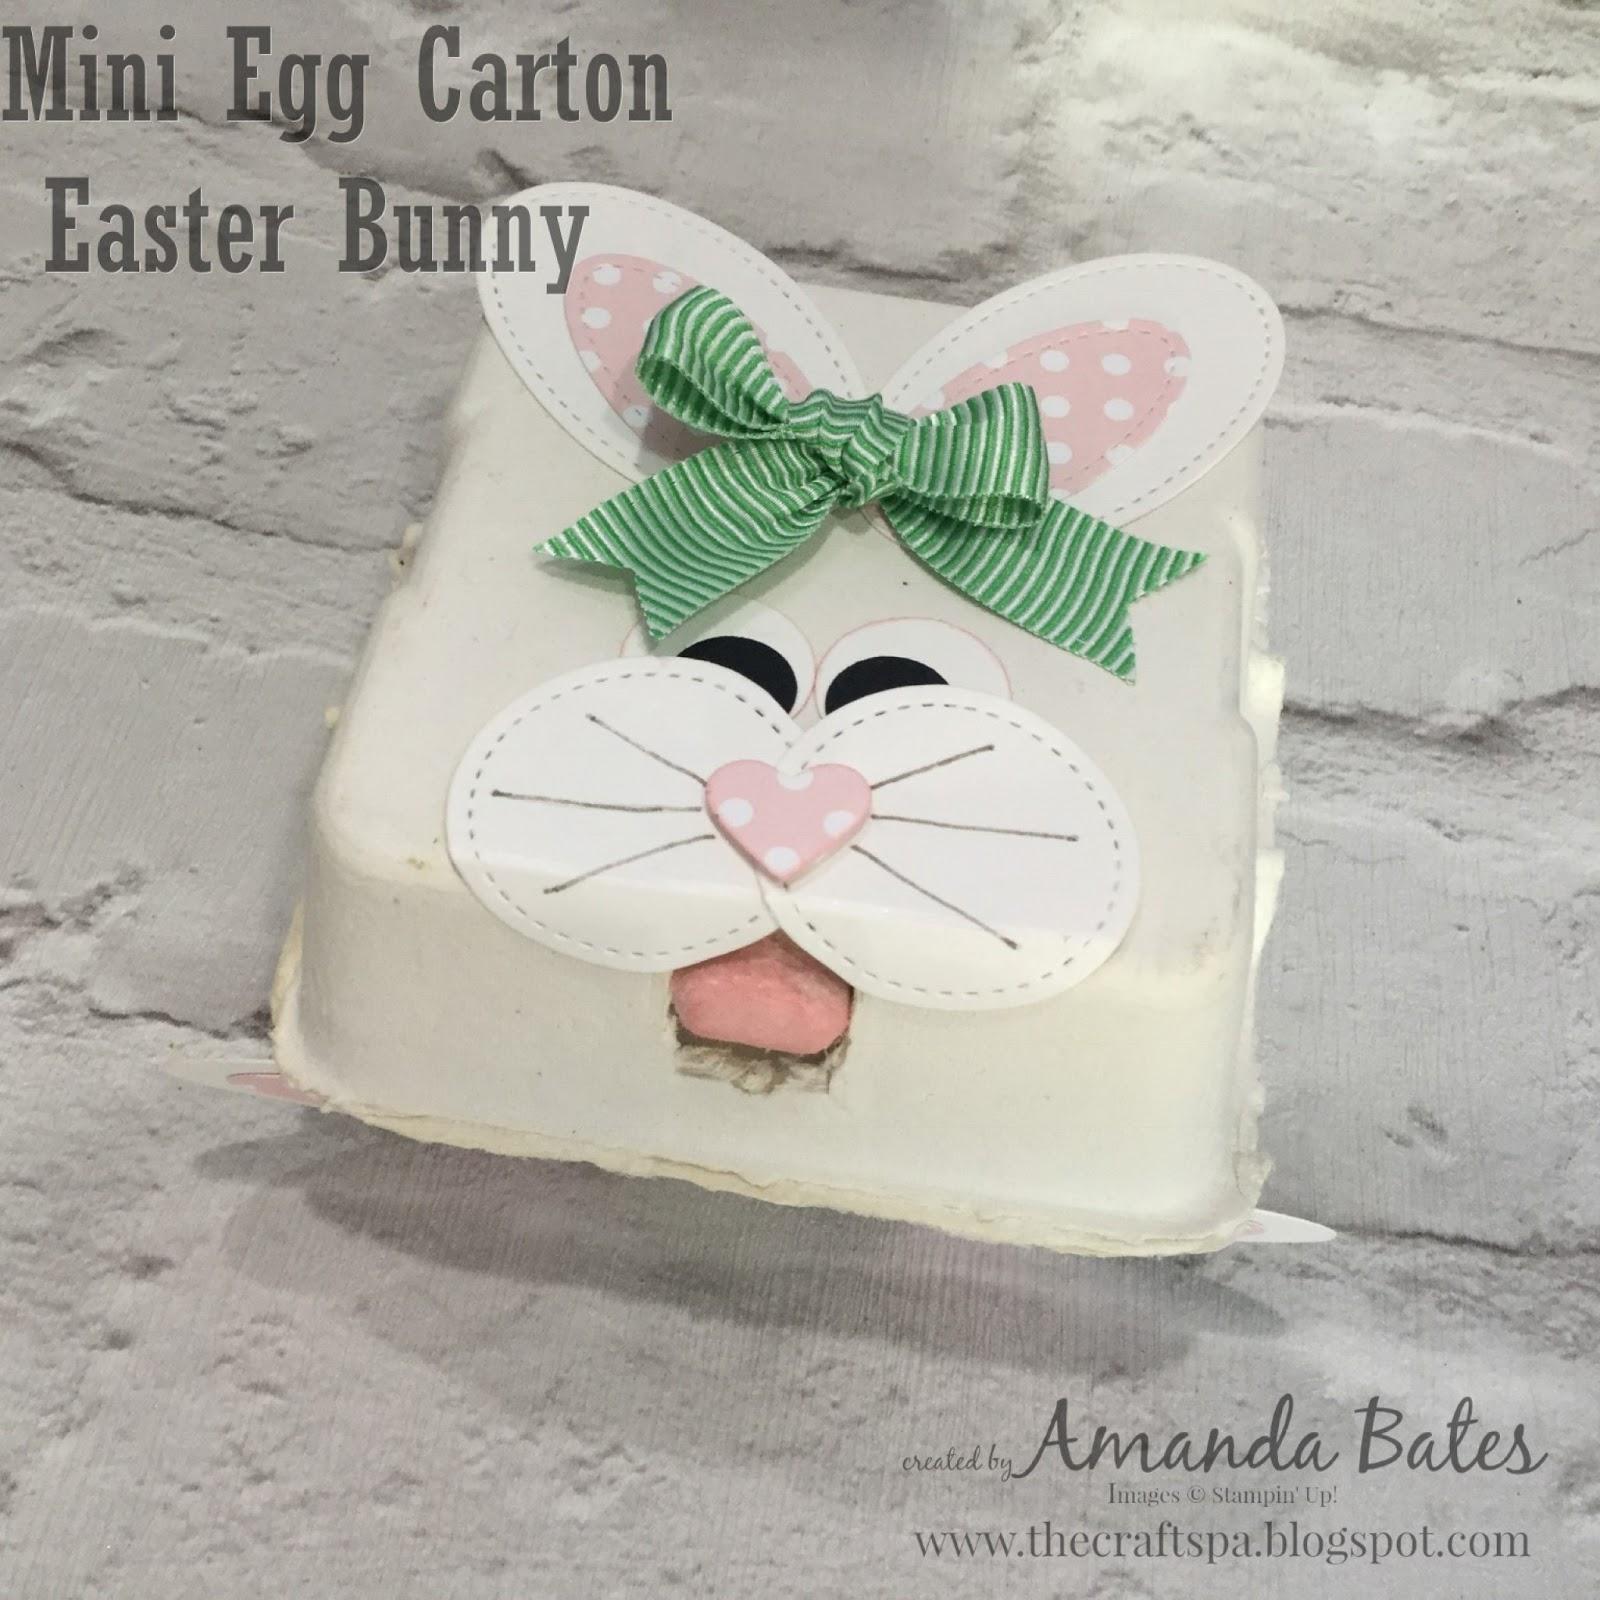 Easter Bunny Mini Egg Carton The Craft